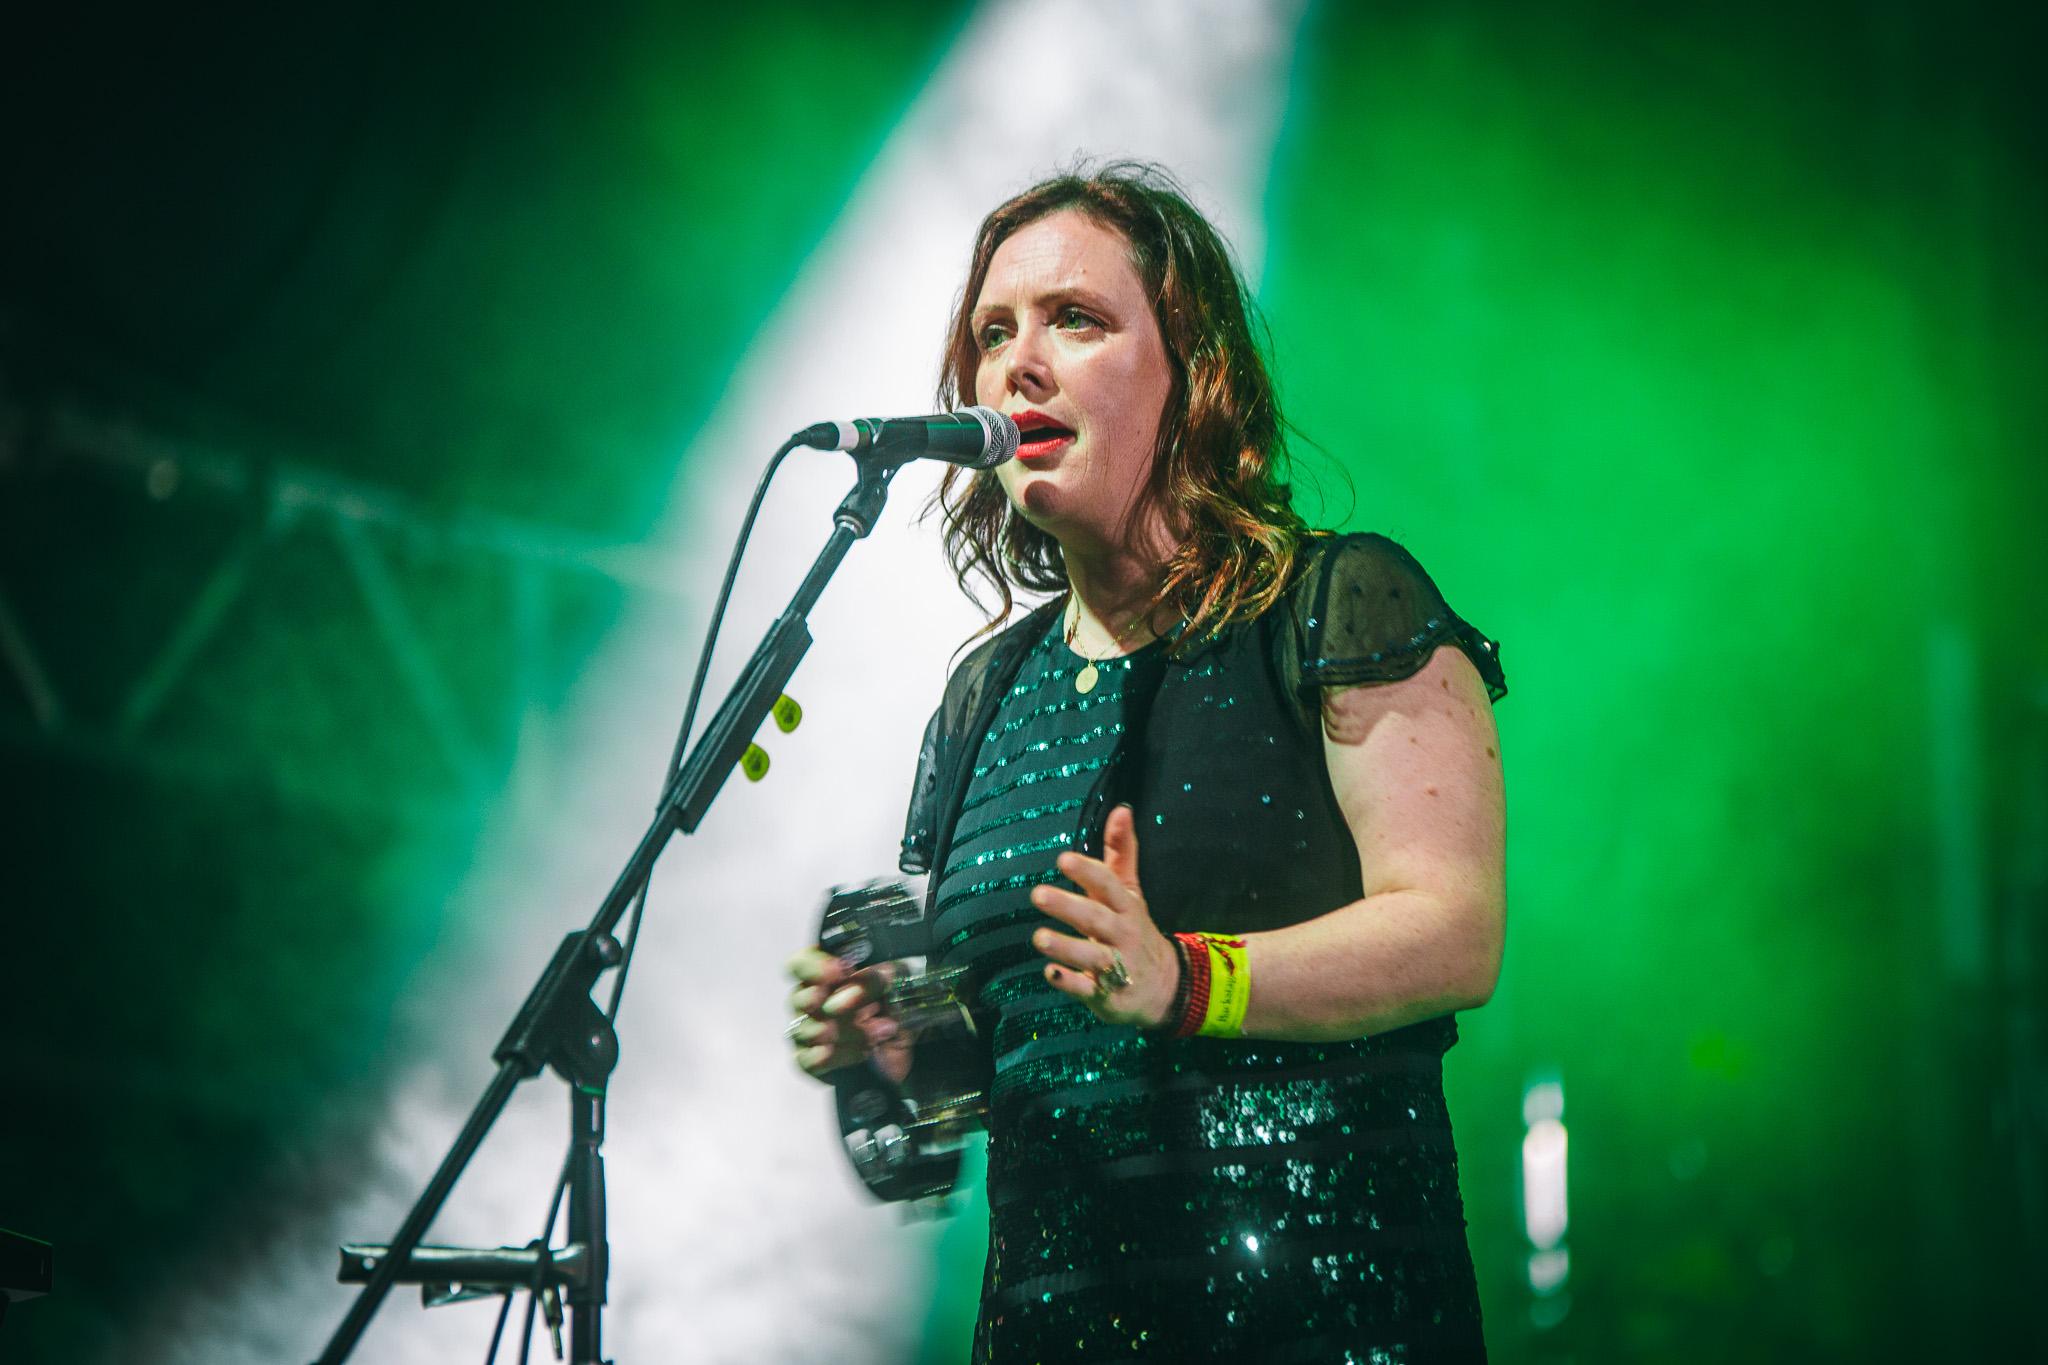 Slowdive_Laneway-Festival-Brisbane-2018_Credit-Bianca-Holderness-2.jpg